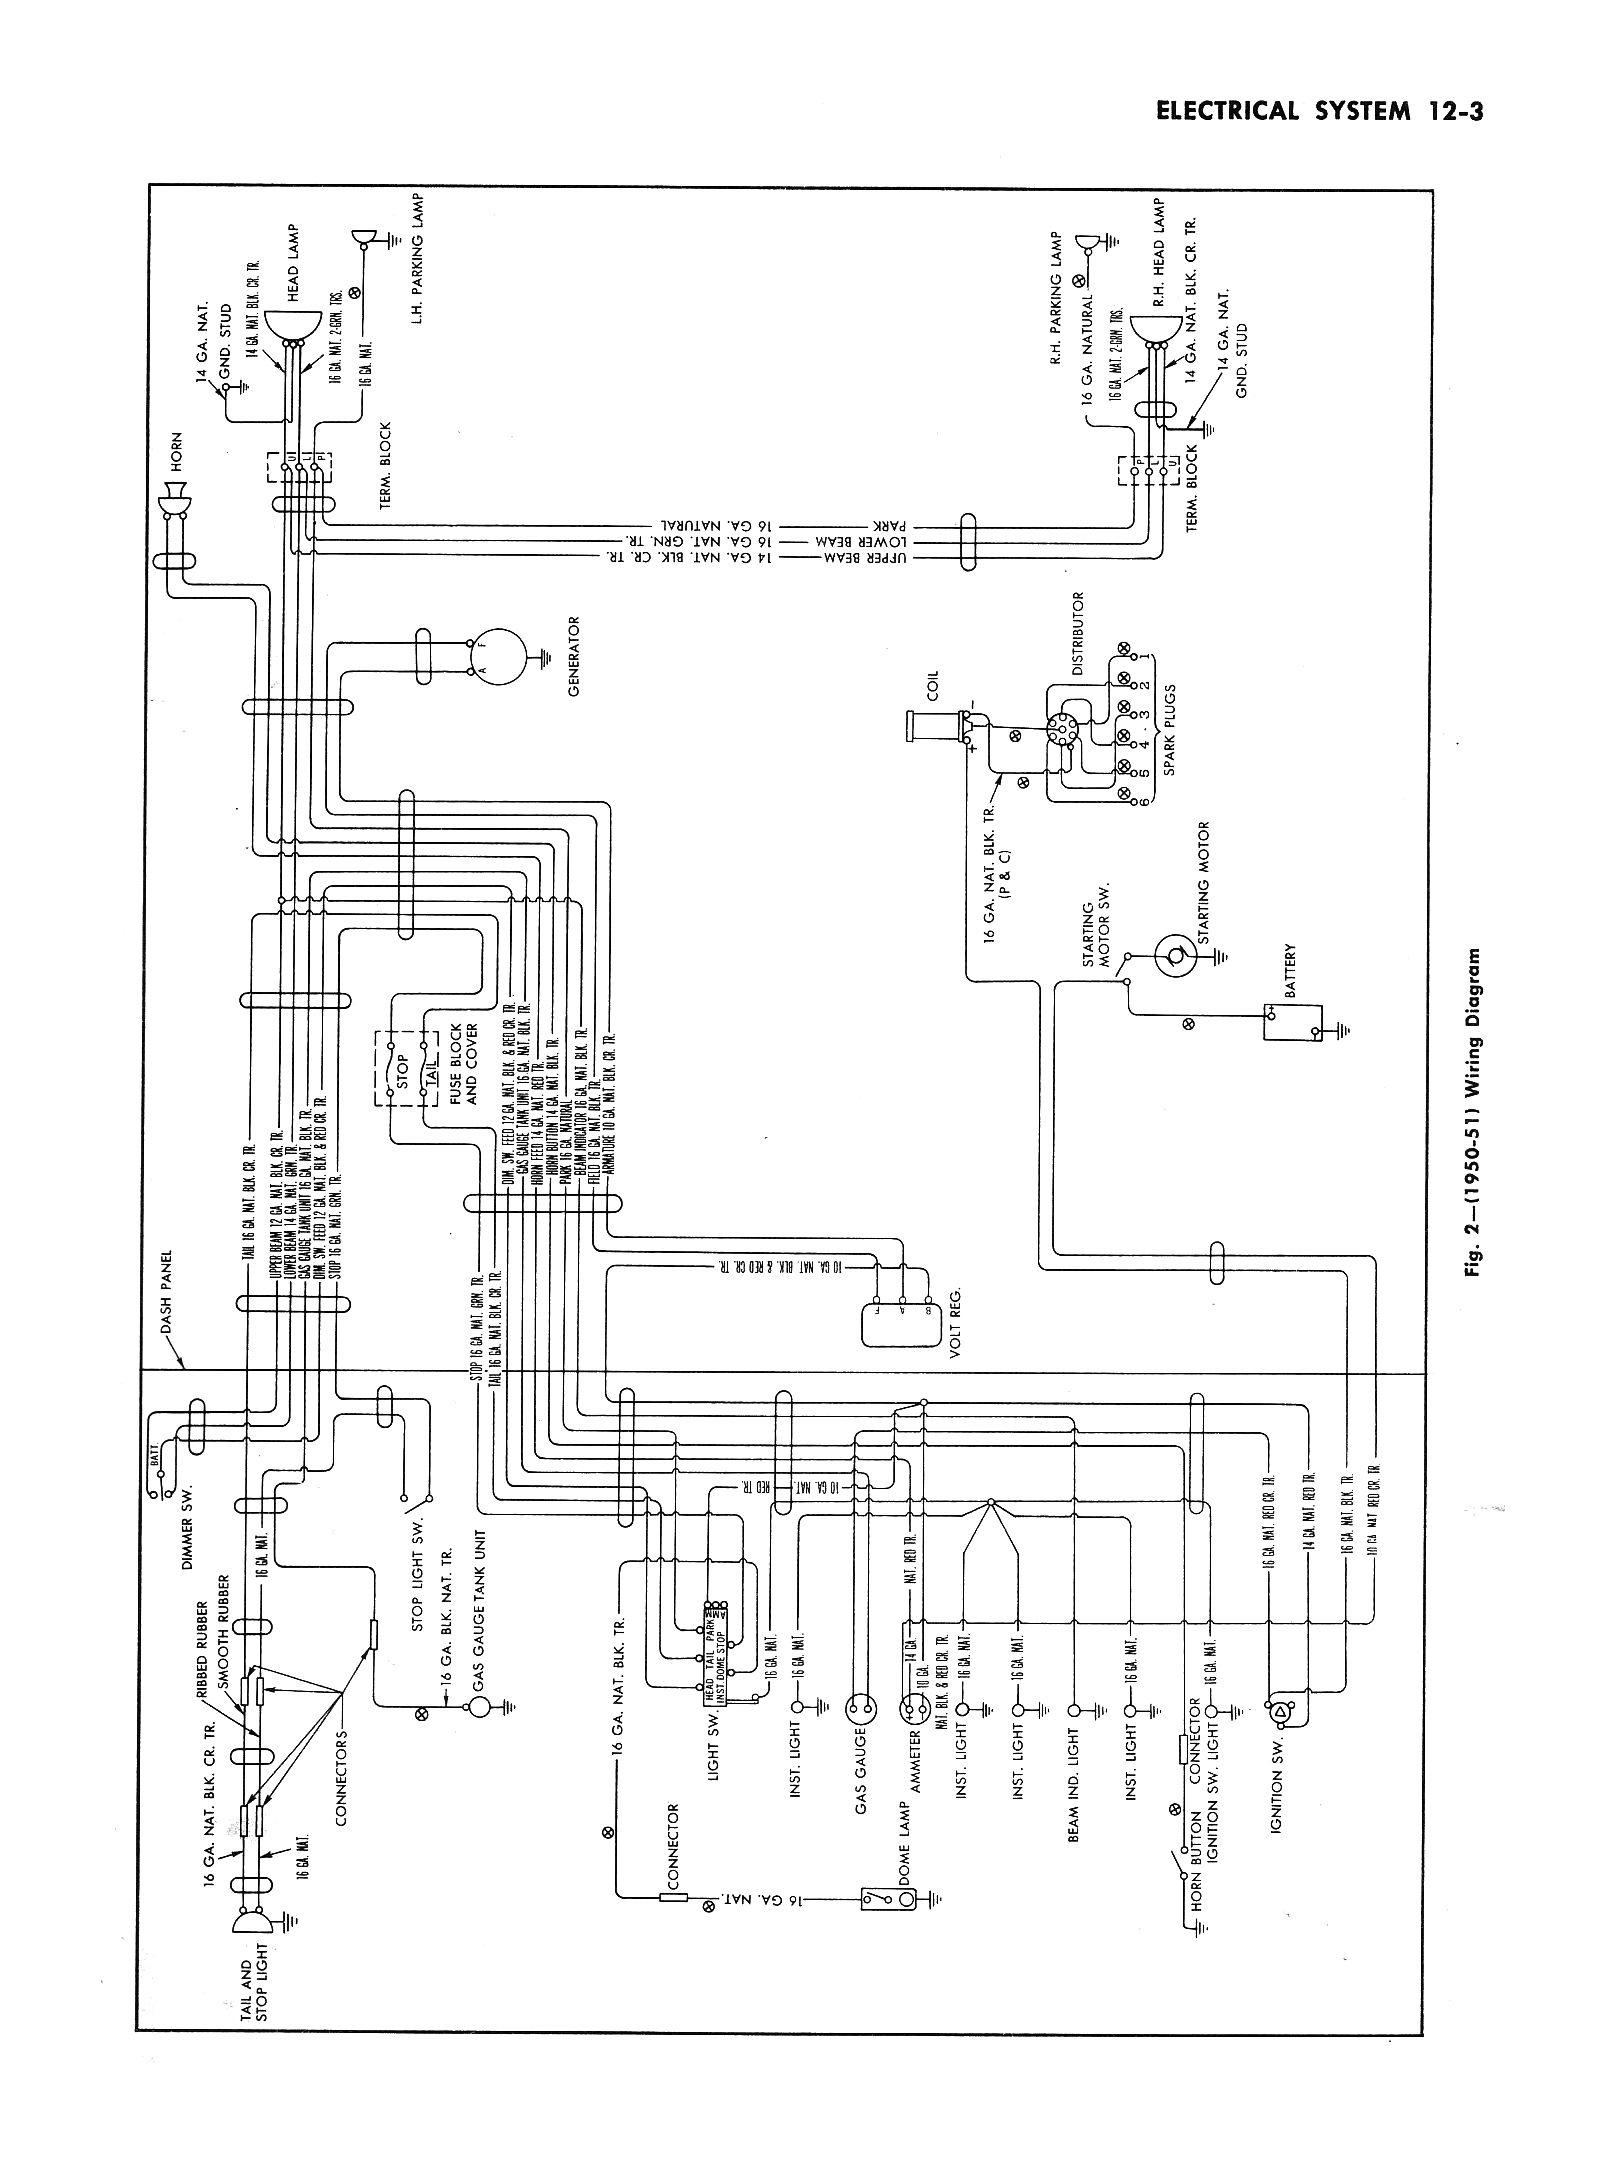 1952 Ford Wiring Diagram - Wiring Diagram Data Oreo - Chevy Alternator Wiring Diagram